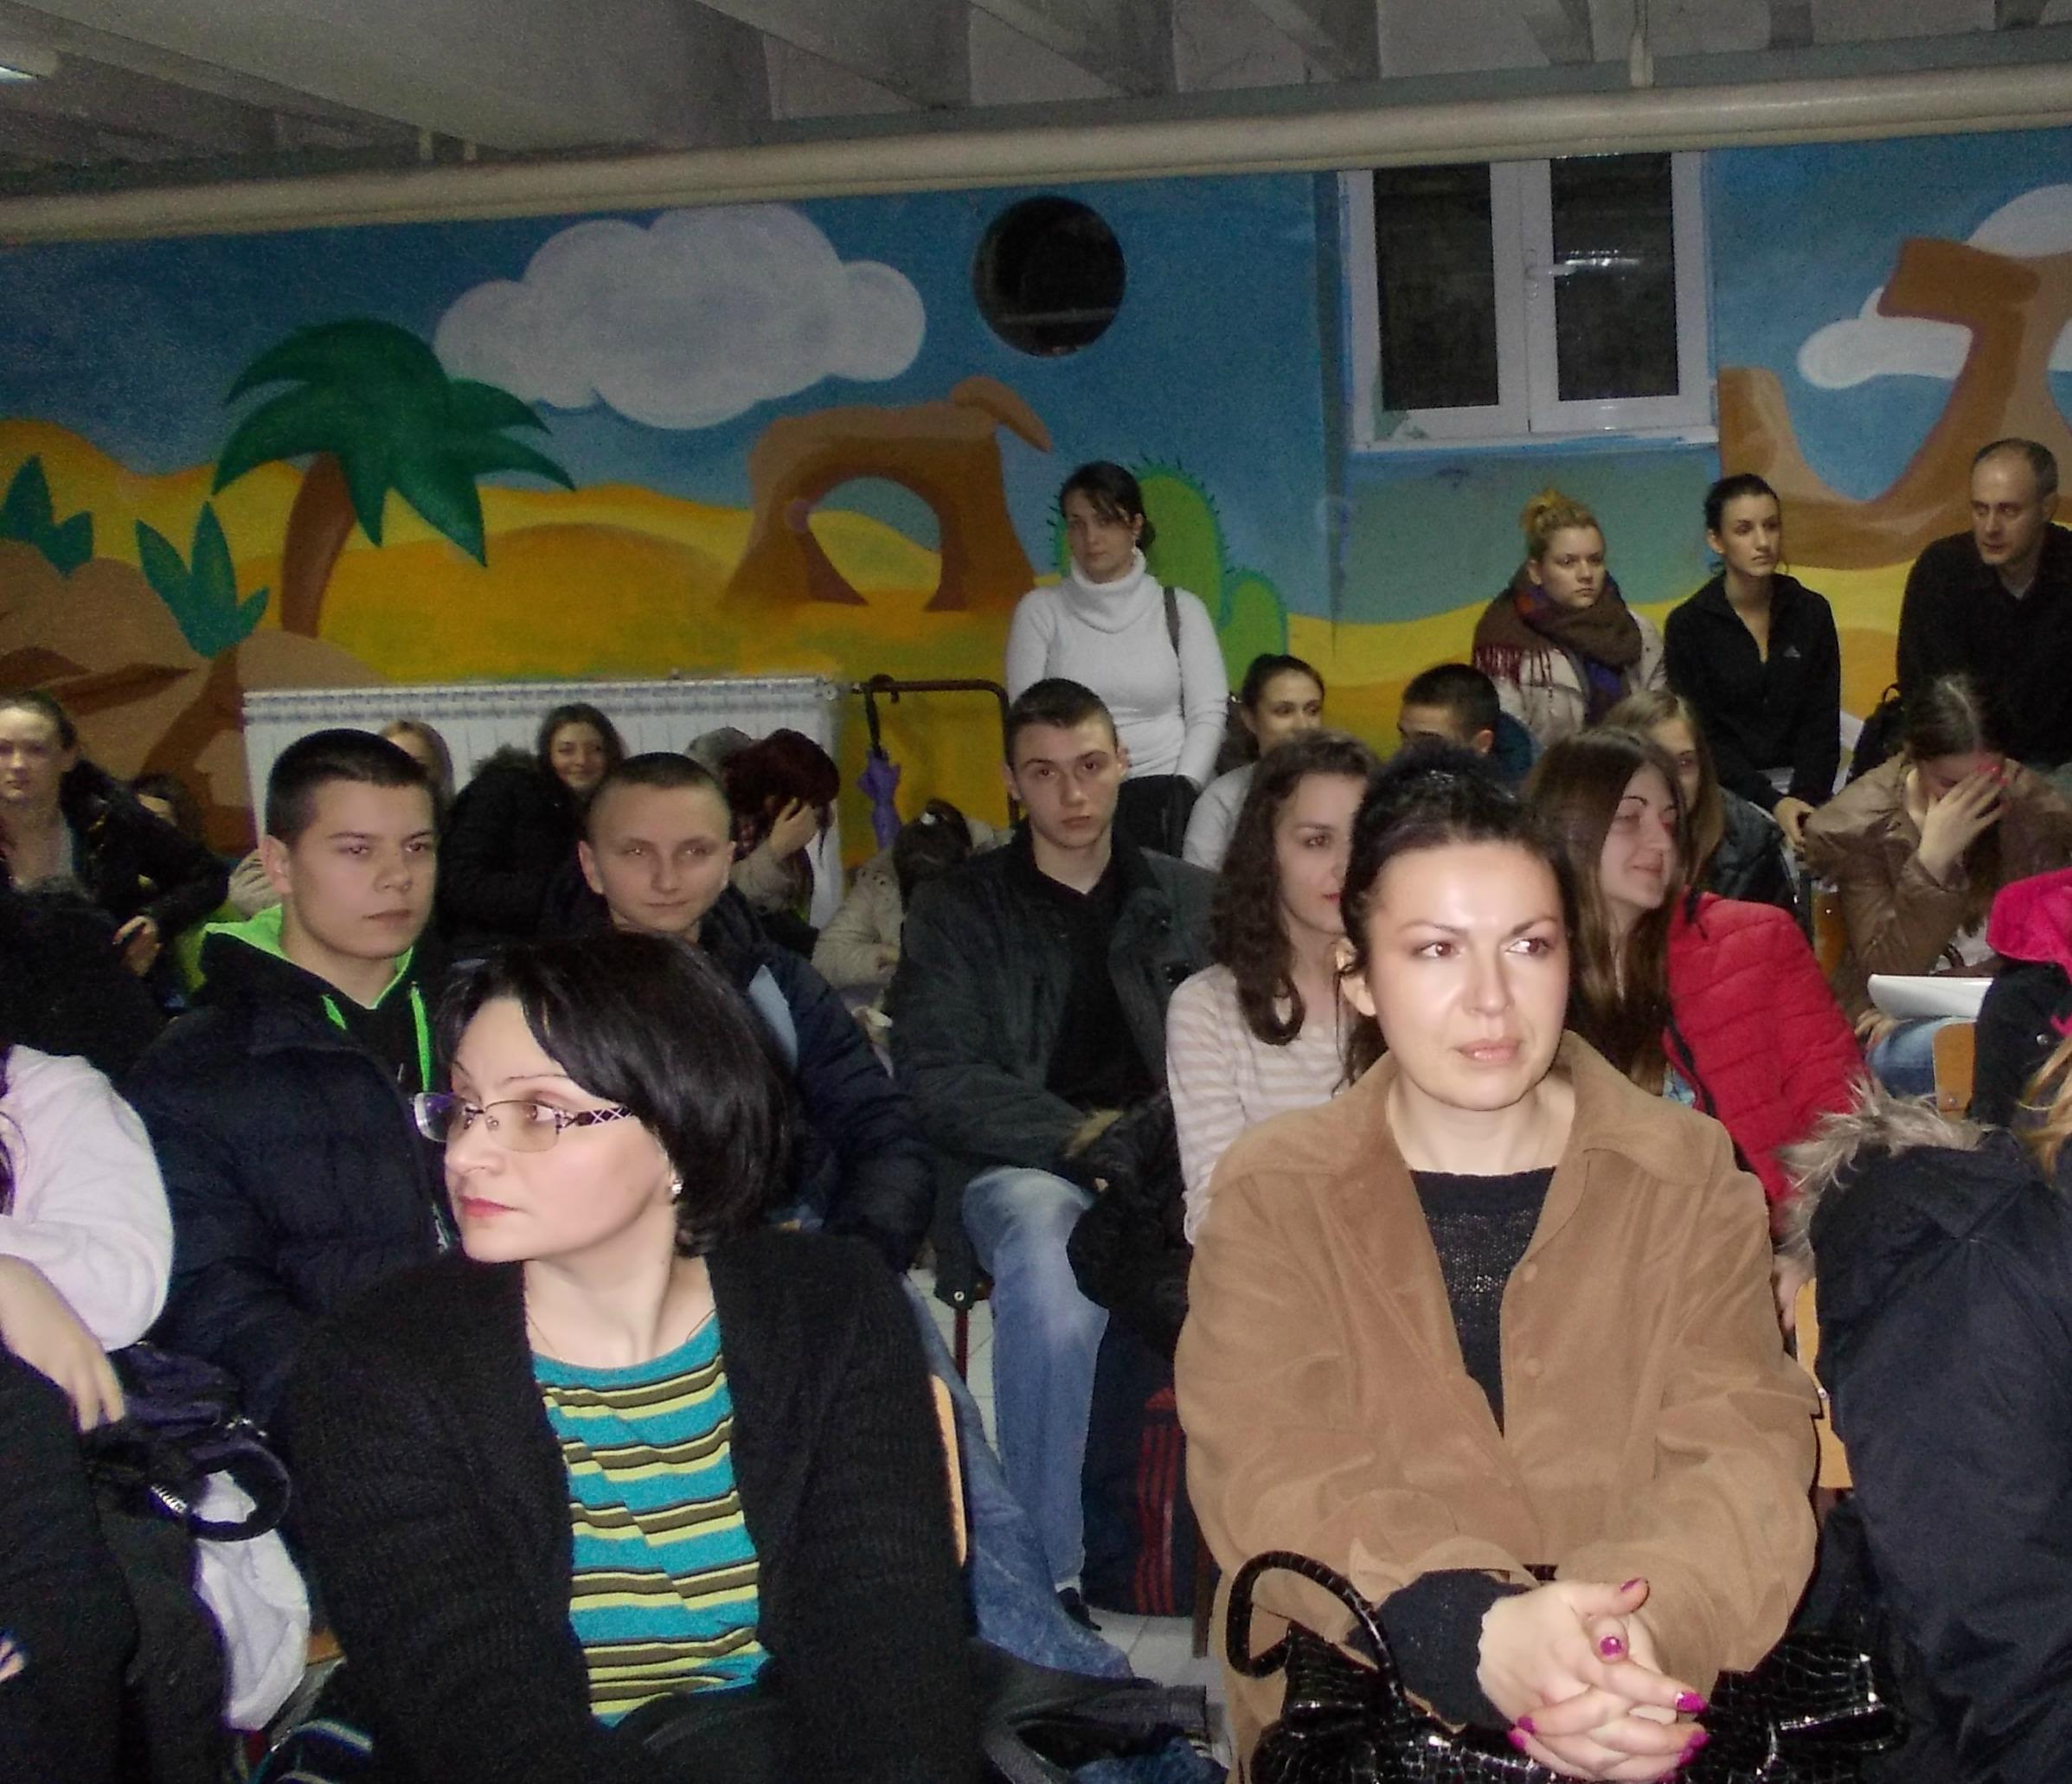 Književno veče sa Zoranom T. Popovićem, Tehnička škola